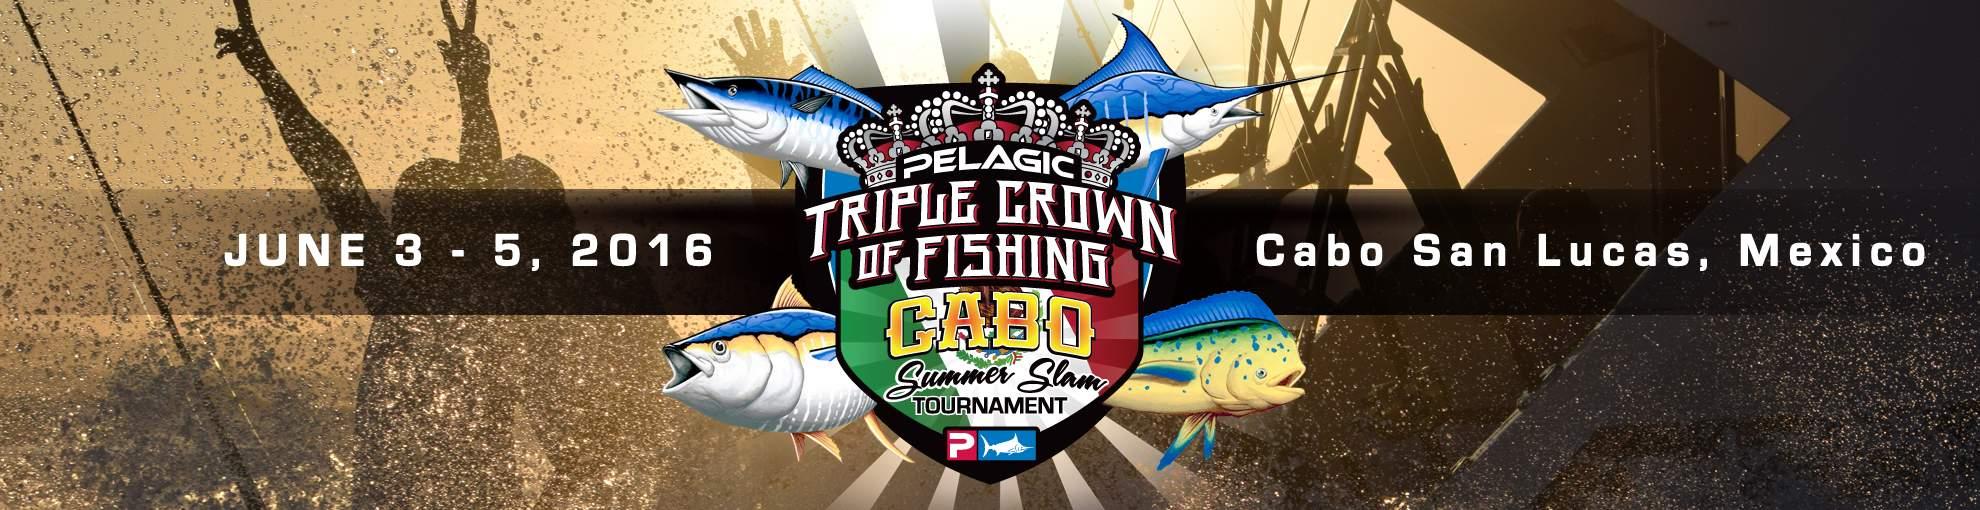 2016 Cabo Summer Slam presented by PELAGIC